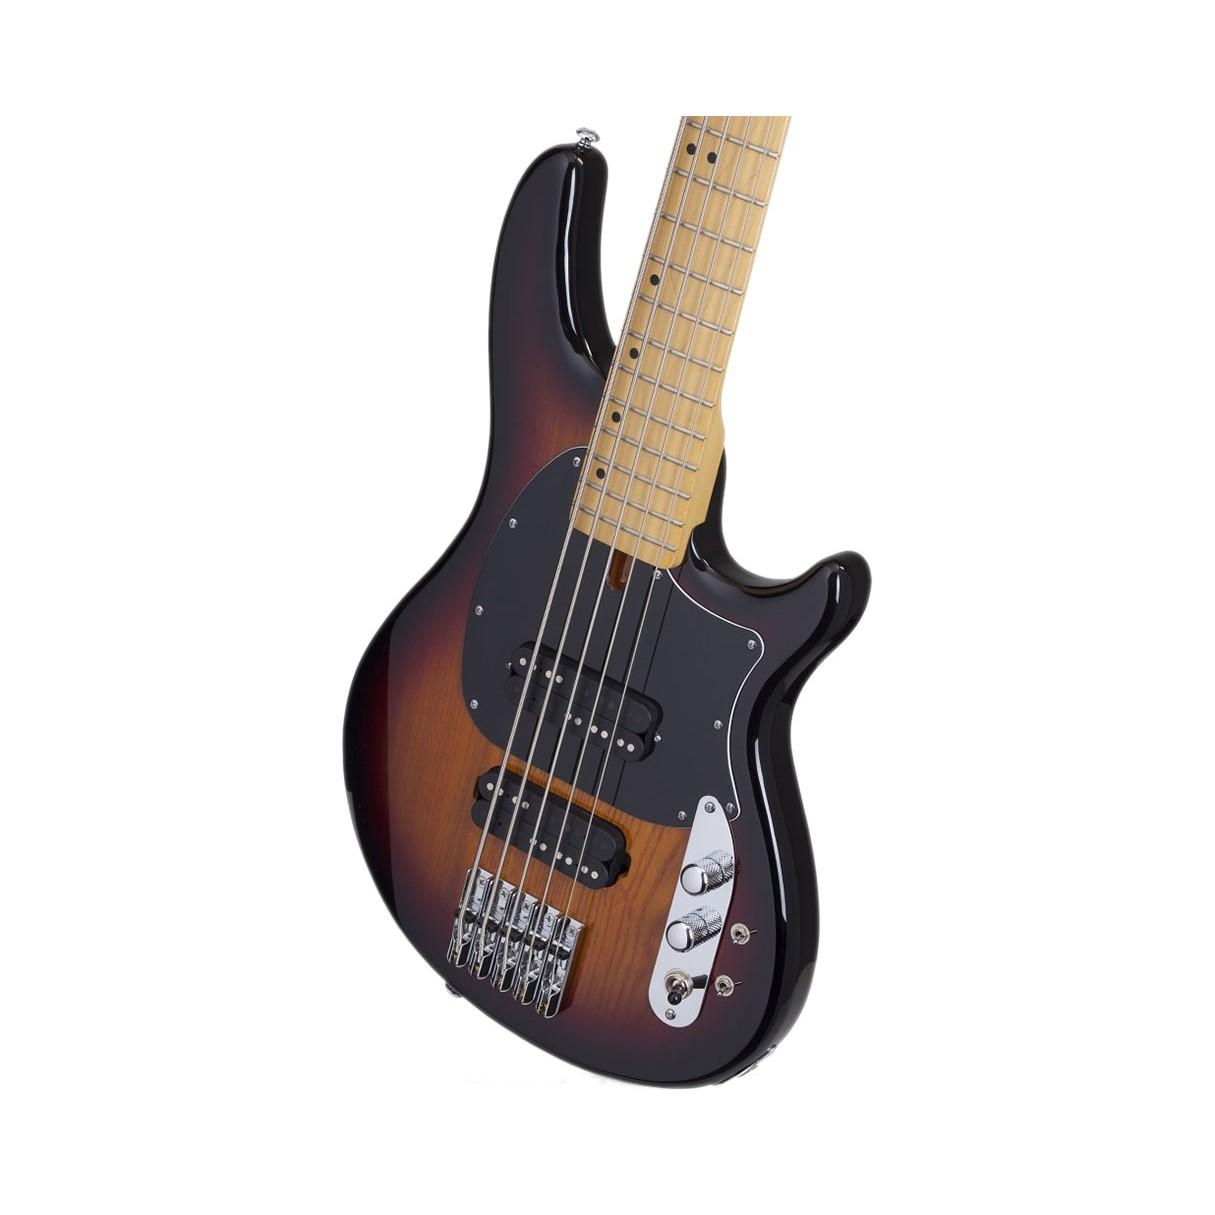 schecter cv 5 5 string bass guitar 3 tone sunburst. Black Bedroom Furniture Sets. Home Design Ideas